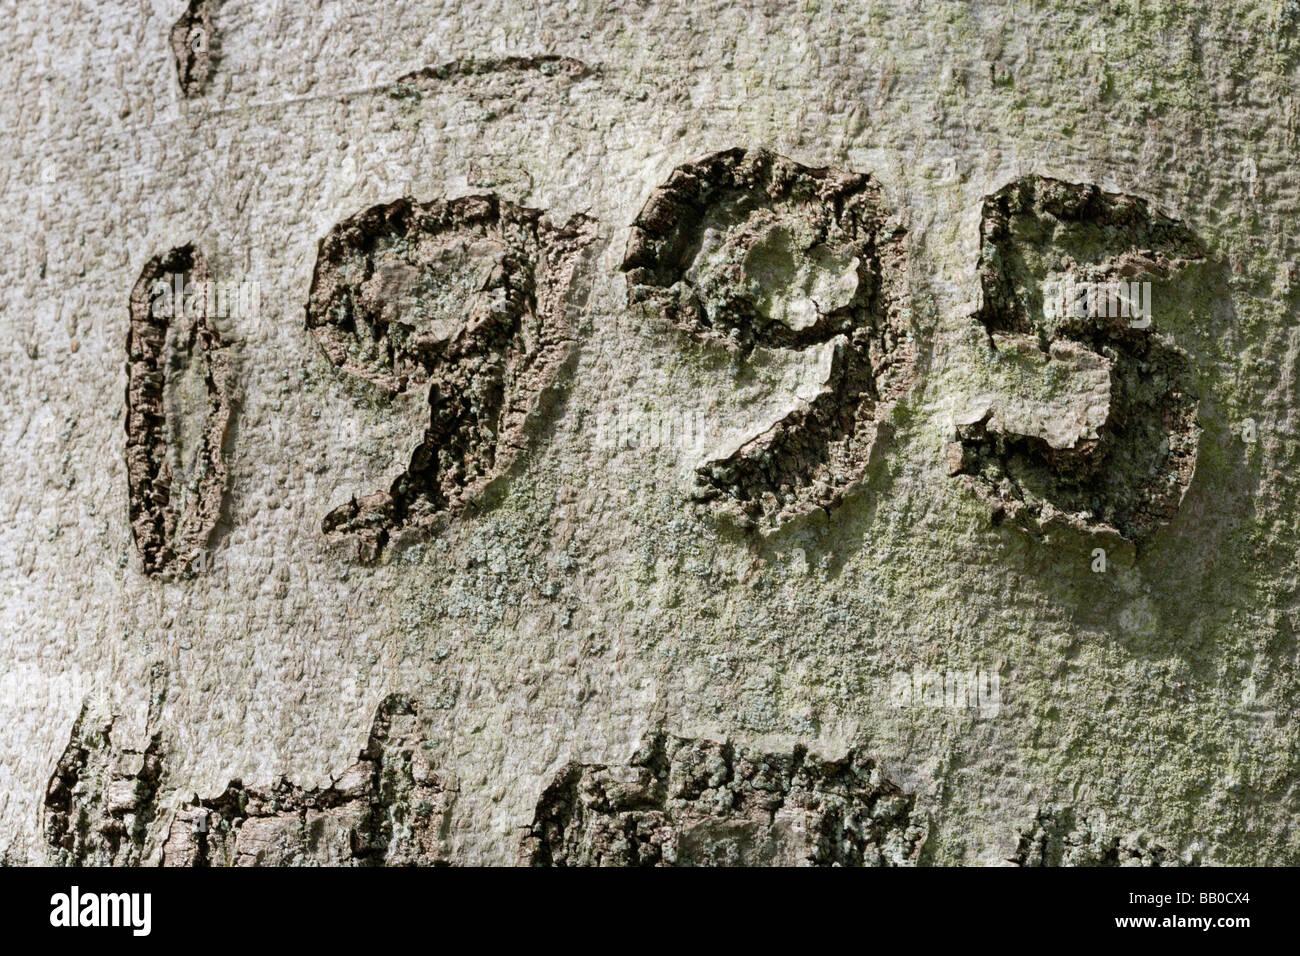 1995 date scored into beech tree trunk bark Stock Photo